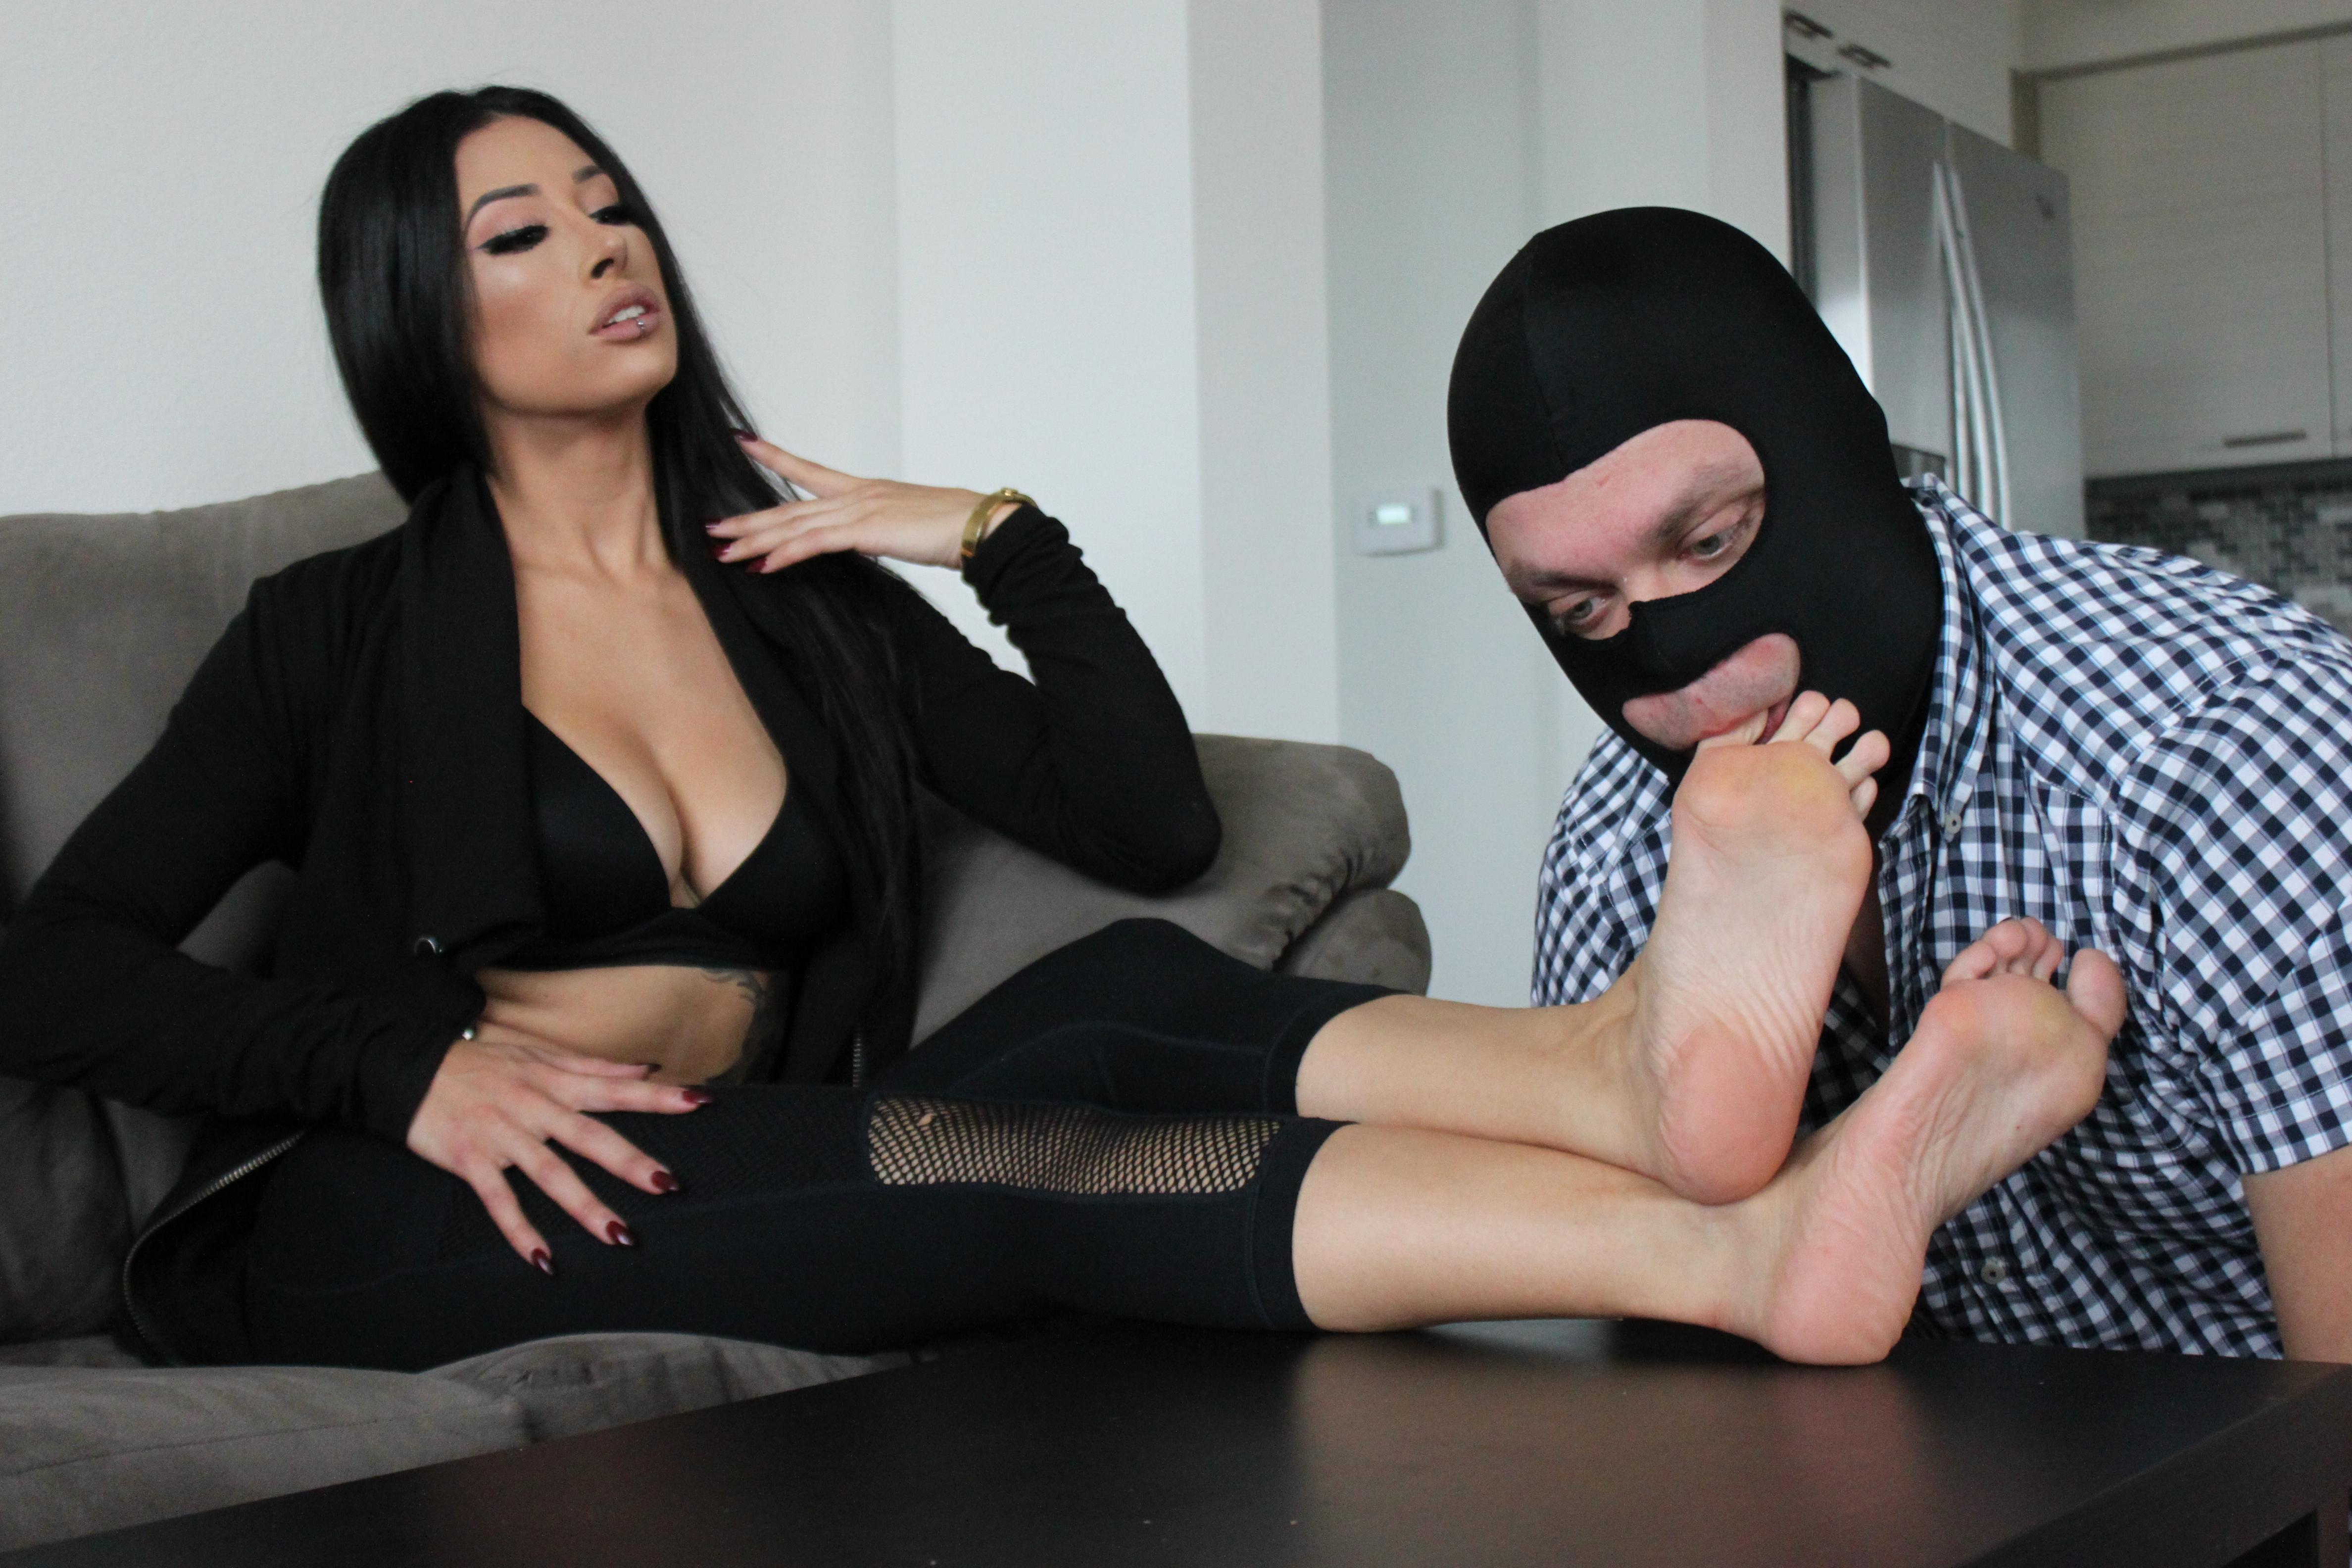 sexy little girl sluts